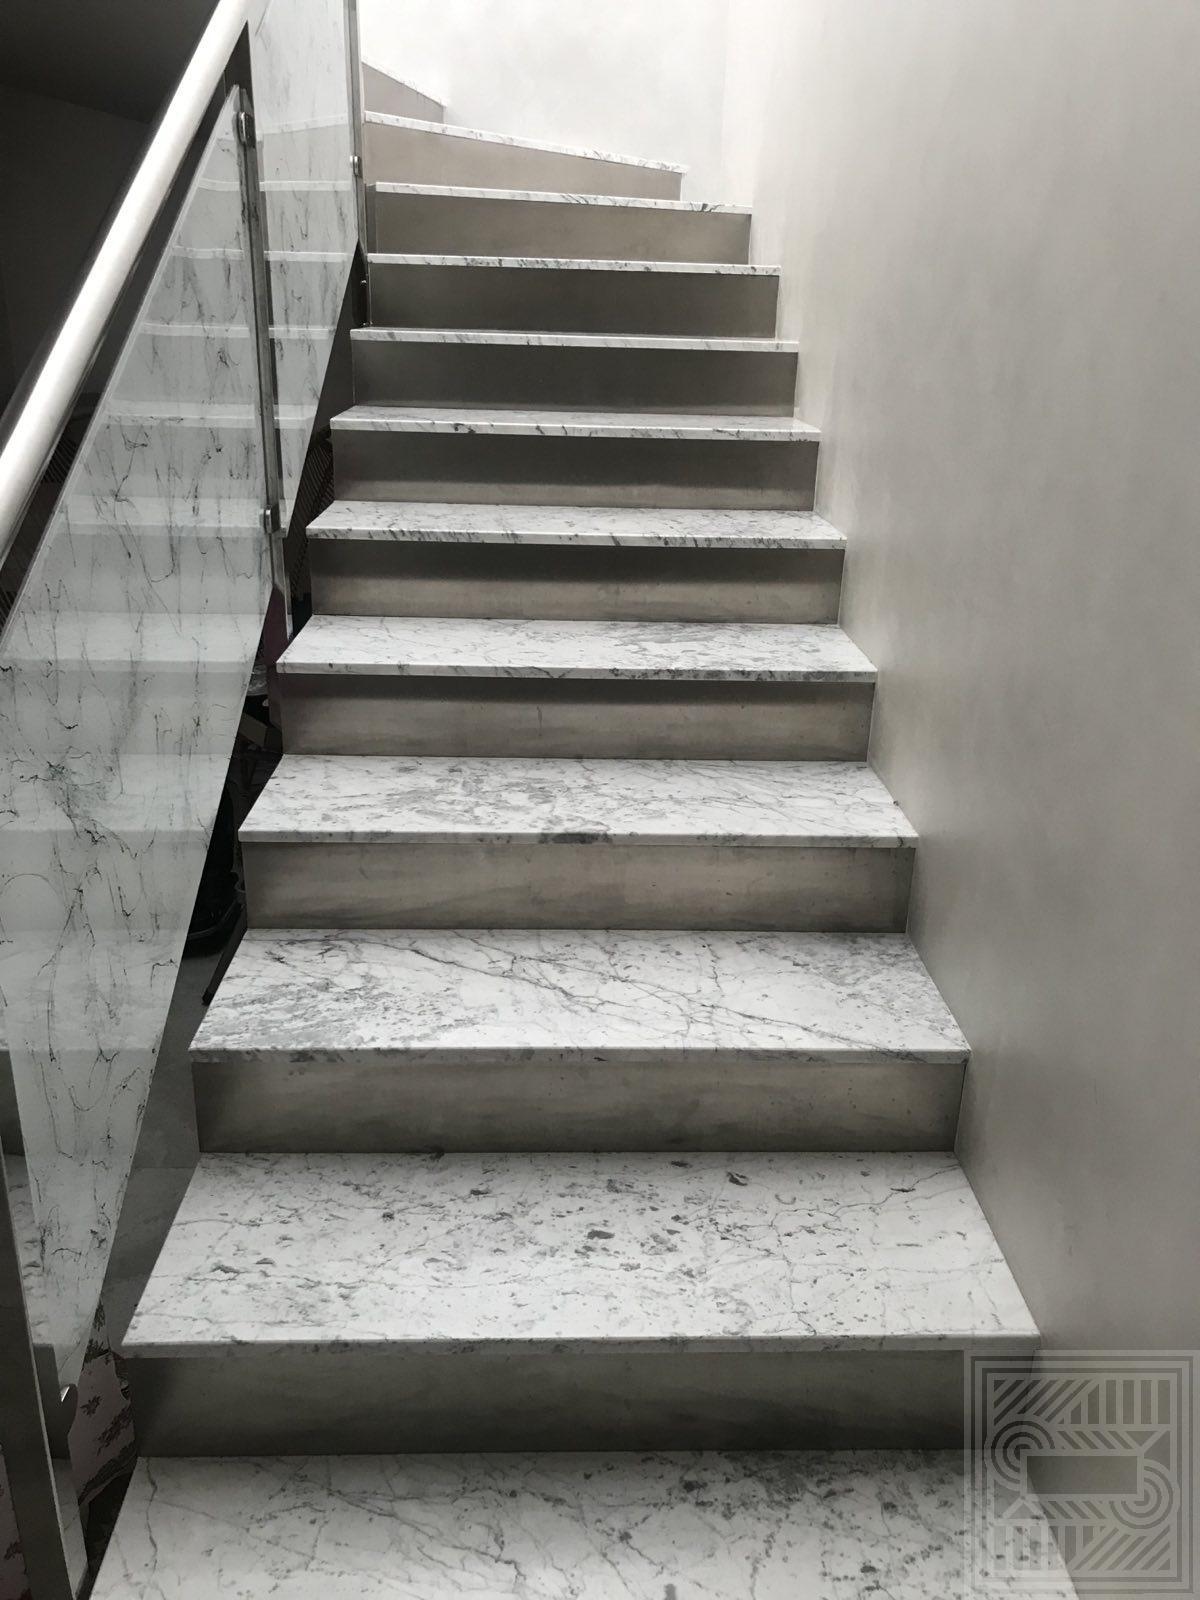 Лестница из мрамора Bianco Carrara stair-marble - Stupeni iz mramora Bianco Carrara2